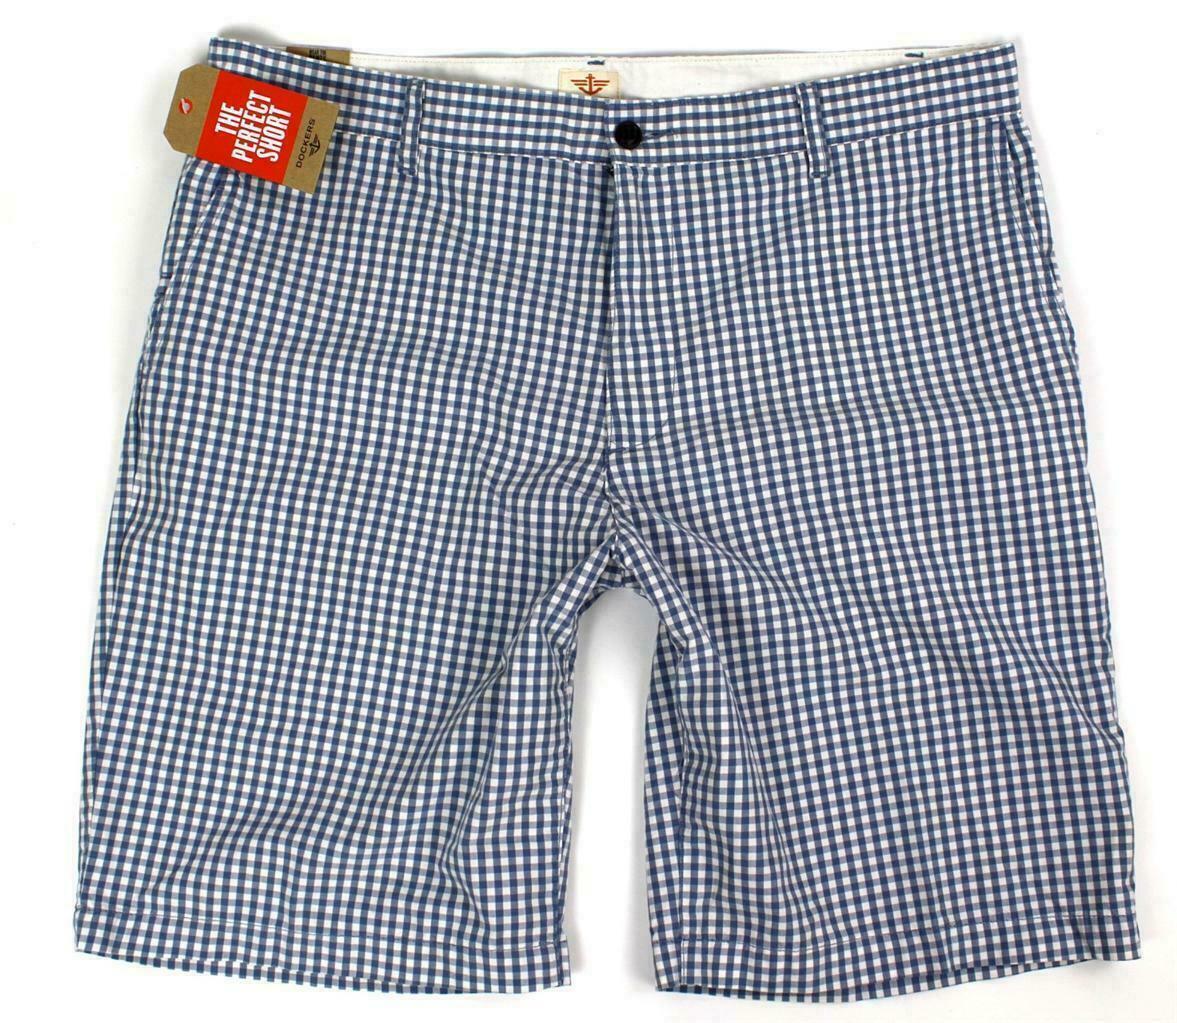 Dockers Men's Classic Premium Cotton Shorts Original Fit 354120035